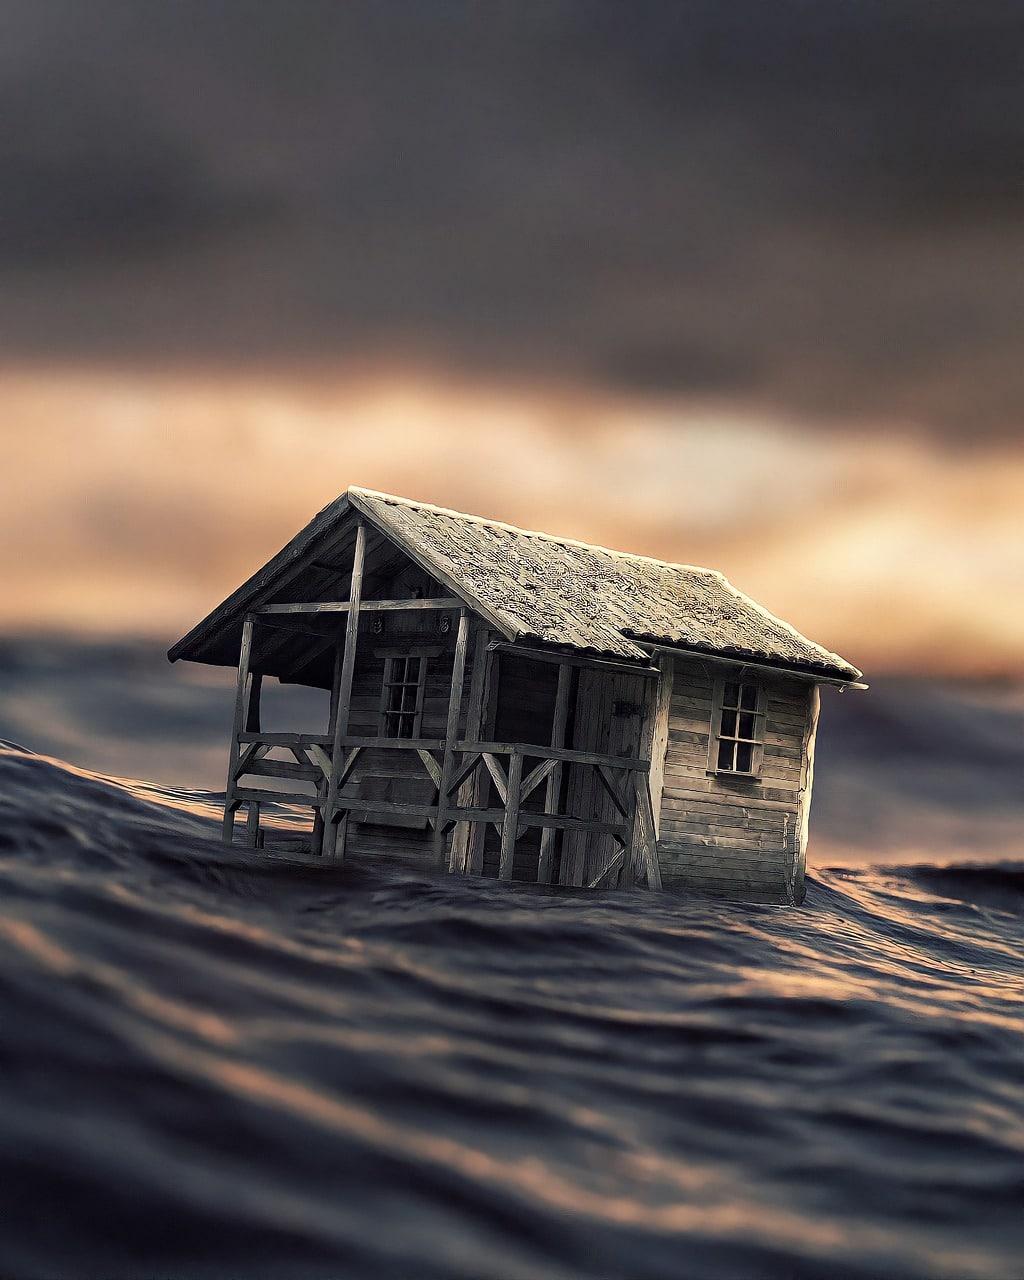 House Water Fantasy Floating  - creativeralph / Pixabay